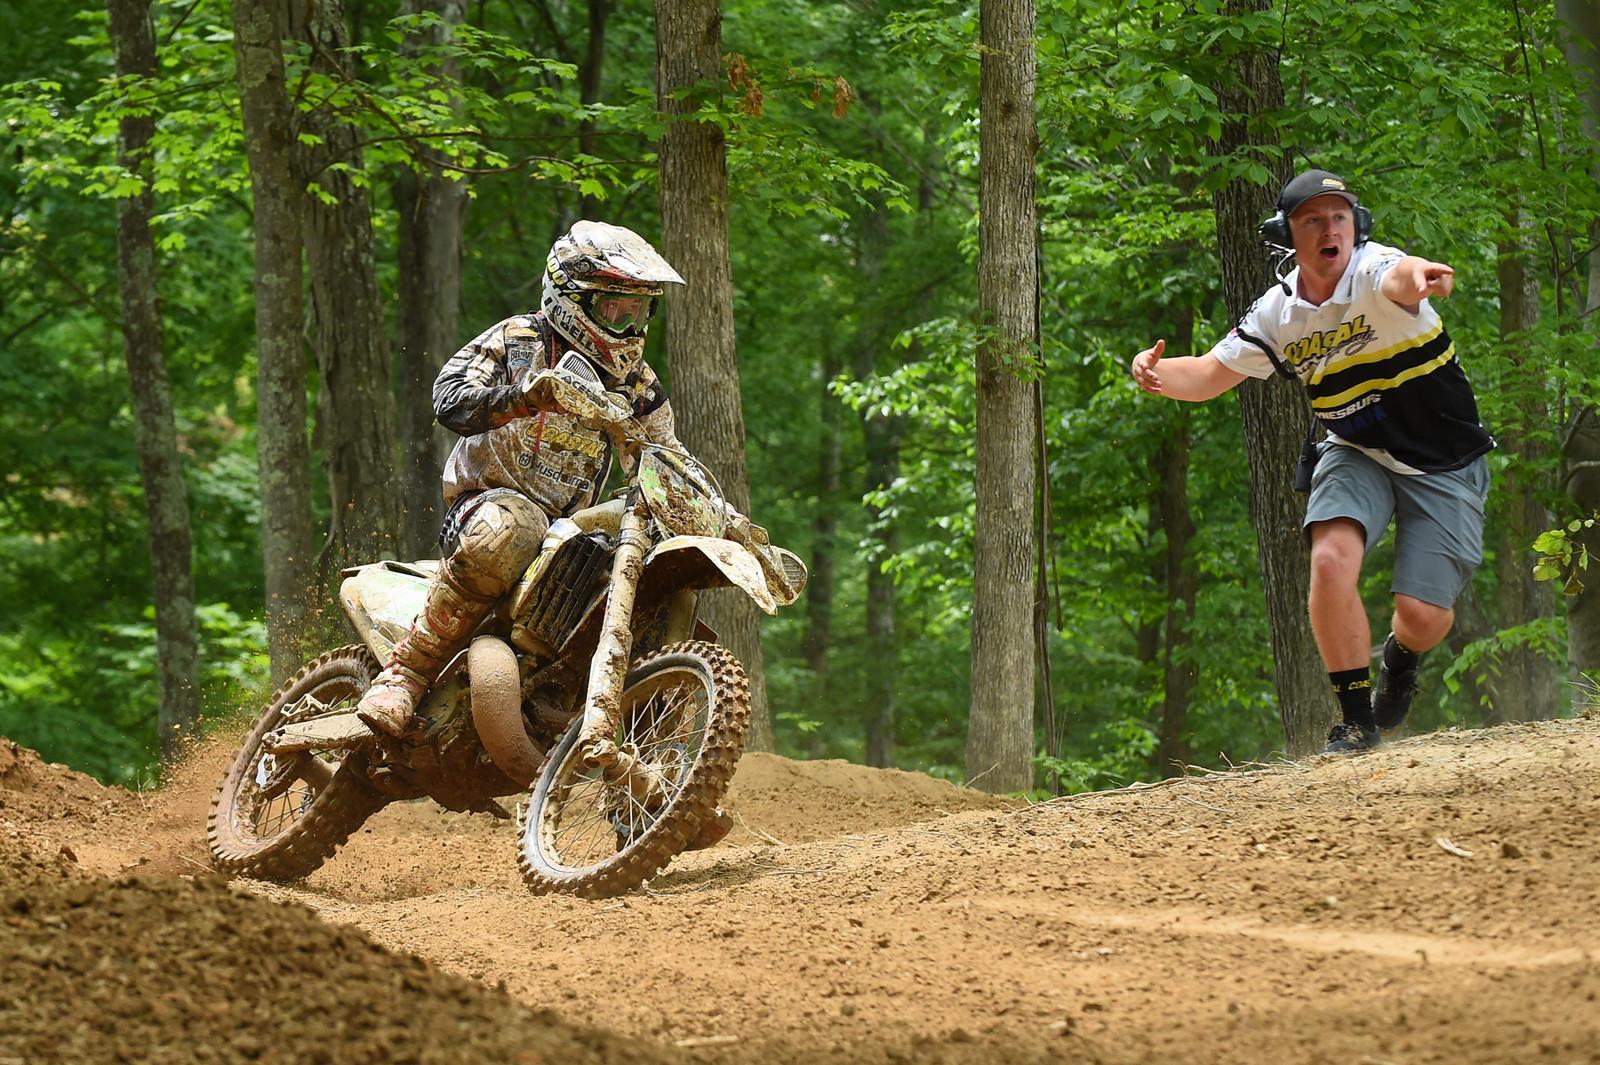 HOE 8352 - John Penton GNCC - Motocross Pictures - Vital MX